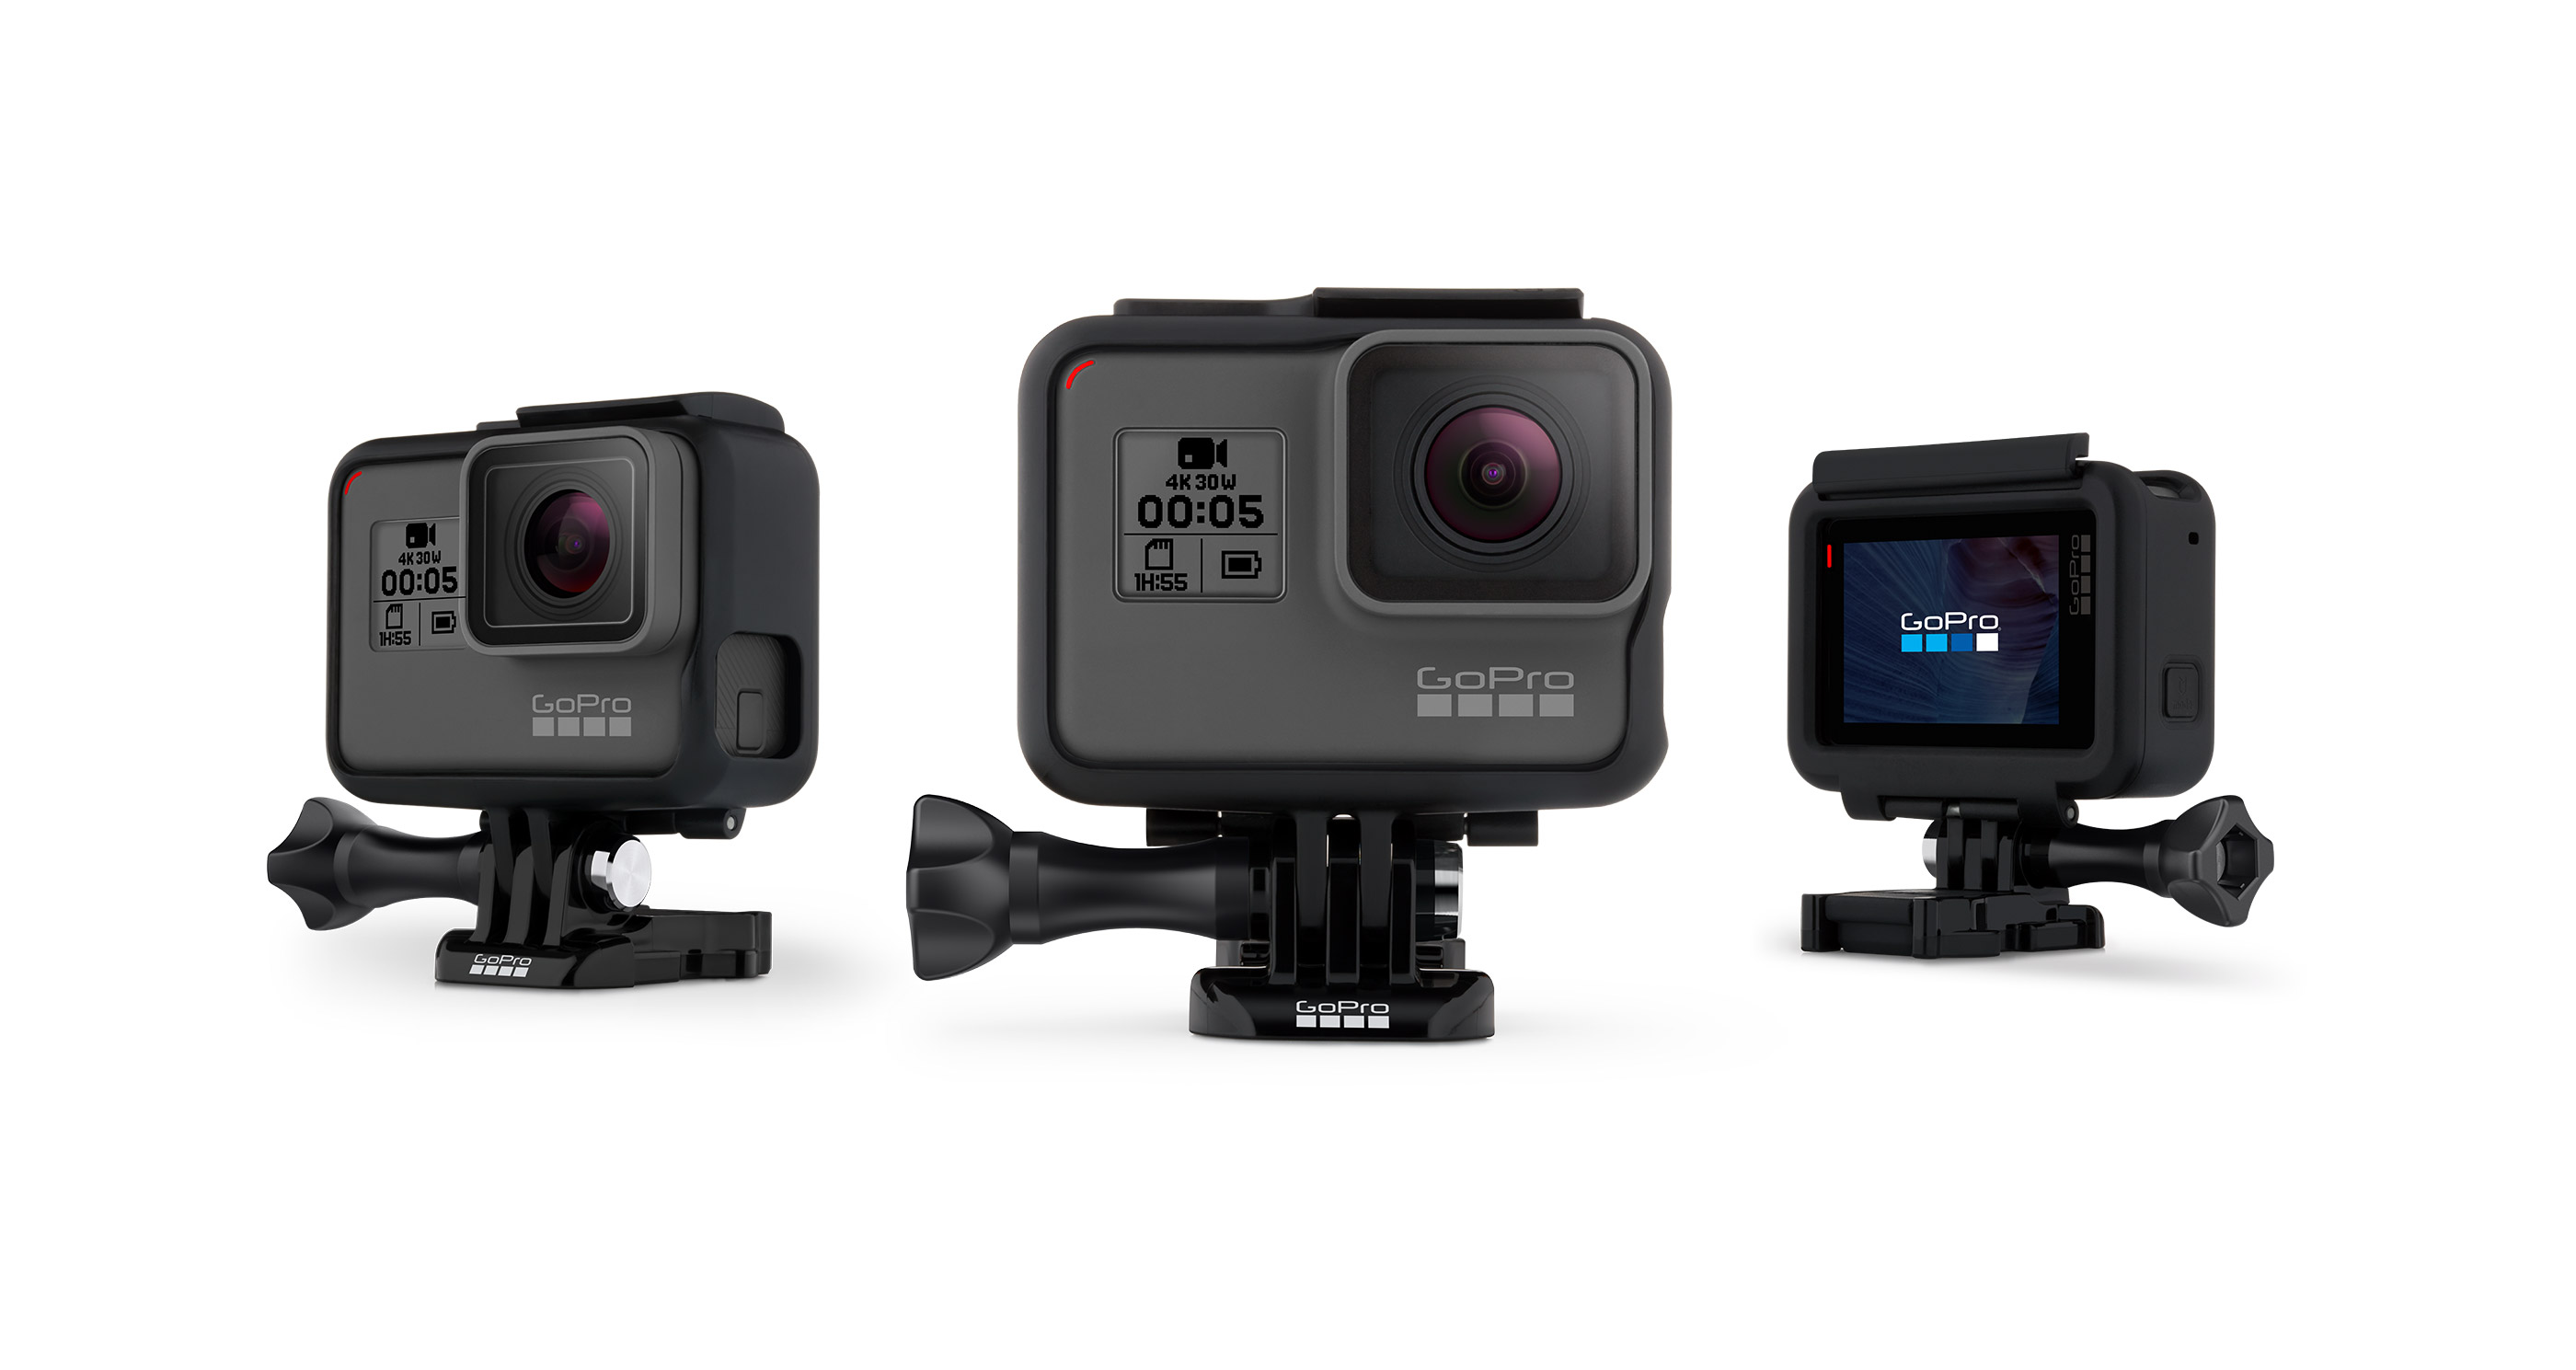 GoPro The Frame H5B/H6B/H7B